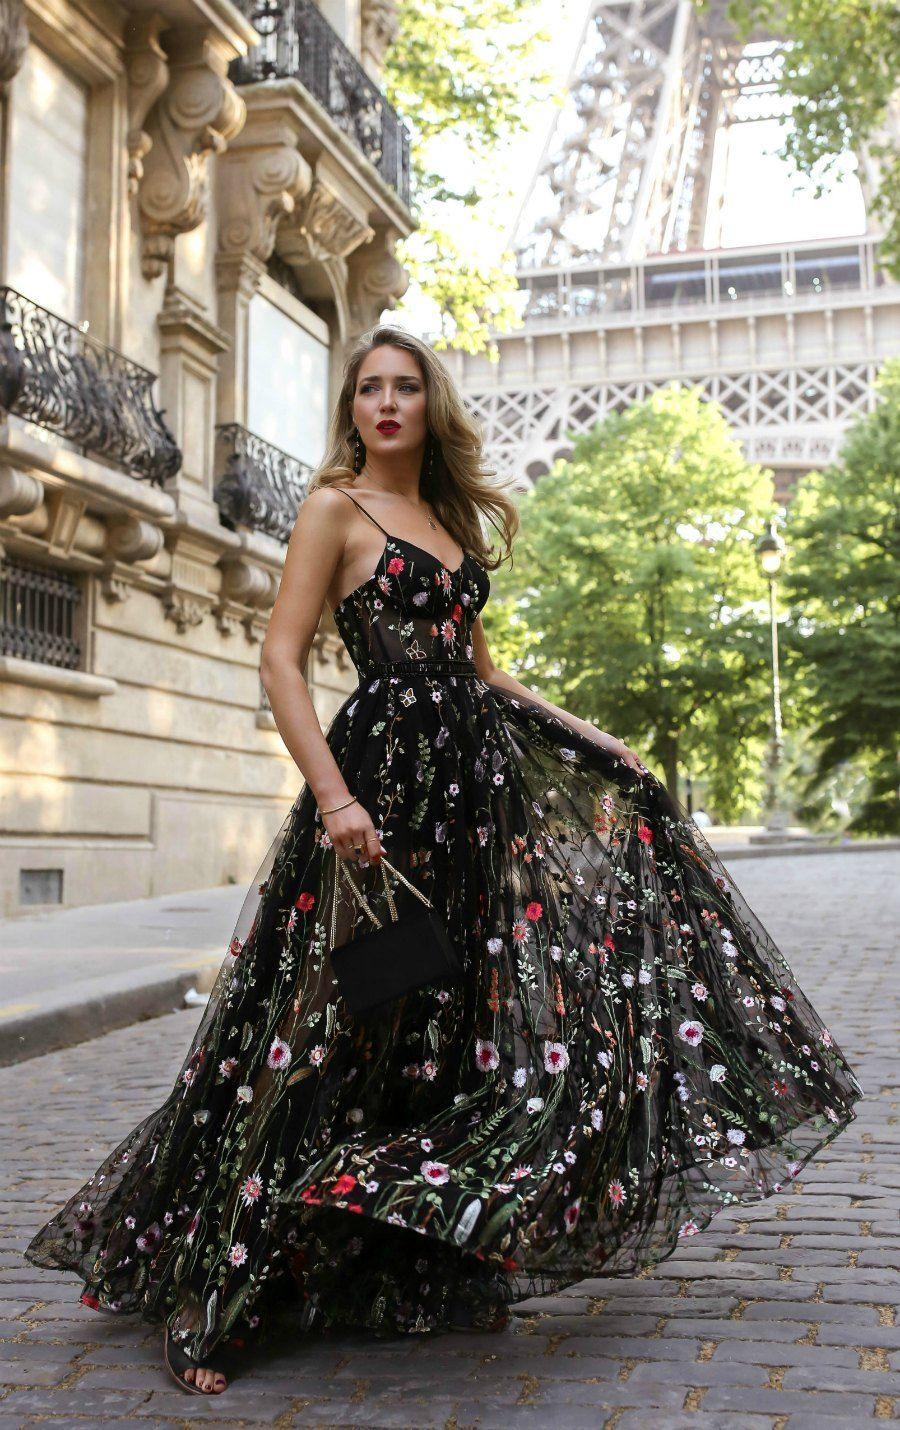 Black Tie Wedding | Best wedding guest dresses, Floral evening dresses, Boho prom dress